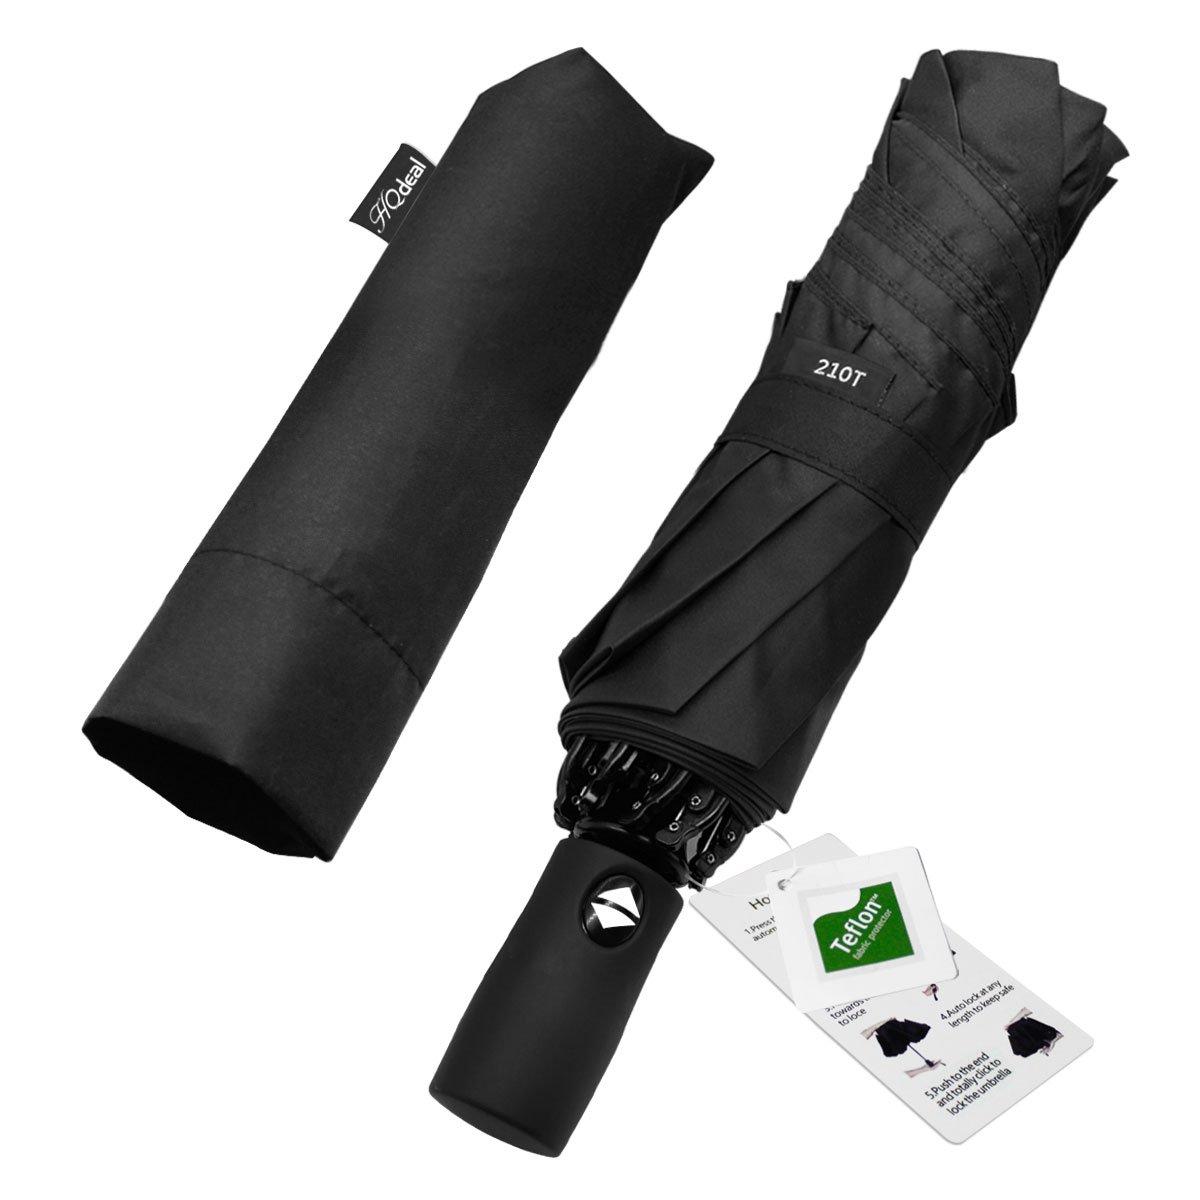 HQdeal Automatic Compact Travel Umbrella with Reverse and Safe Lock Design, Teflon 210T Auto Open Close Folding Strong Windproof Umbrella Black